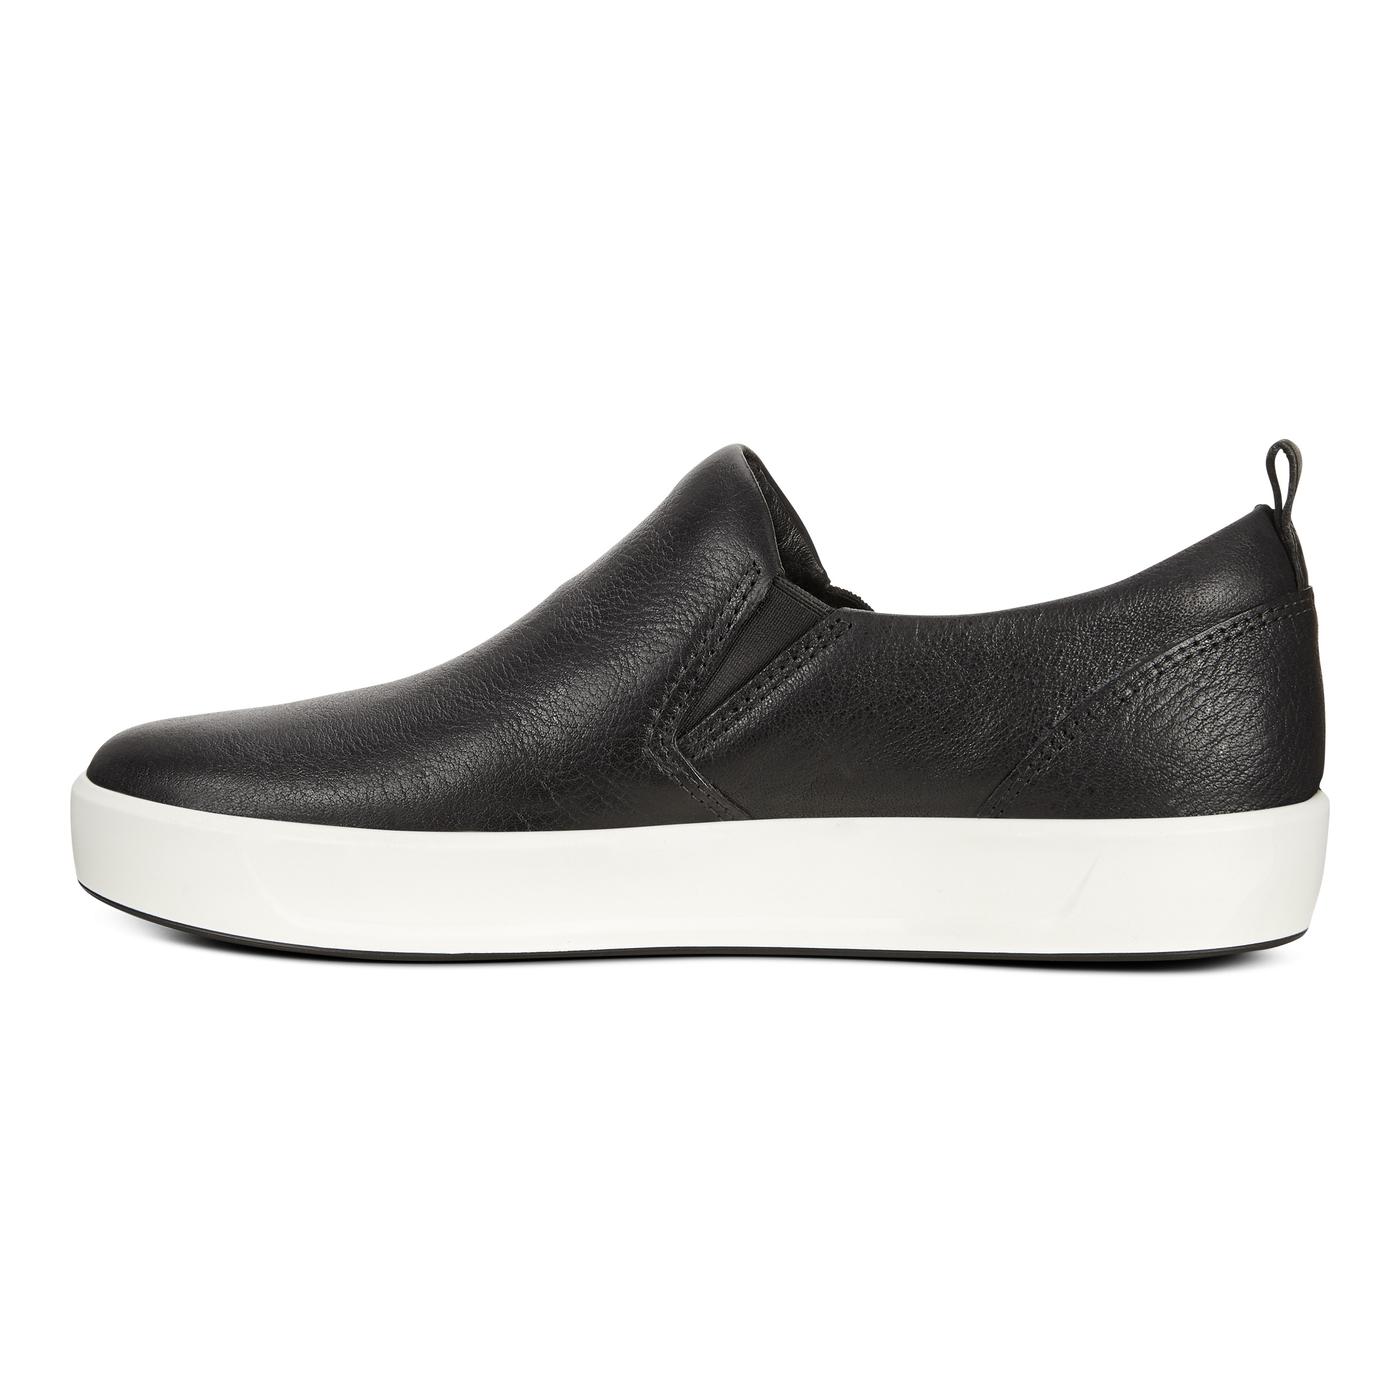 4914bd4d ECCO Women's Soft 8 Slip On | Sneakers | ECCO® Shoes